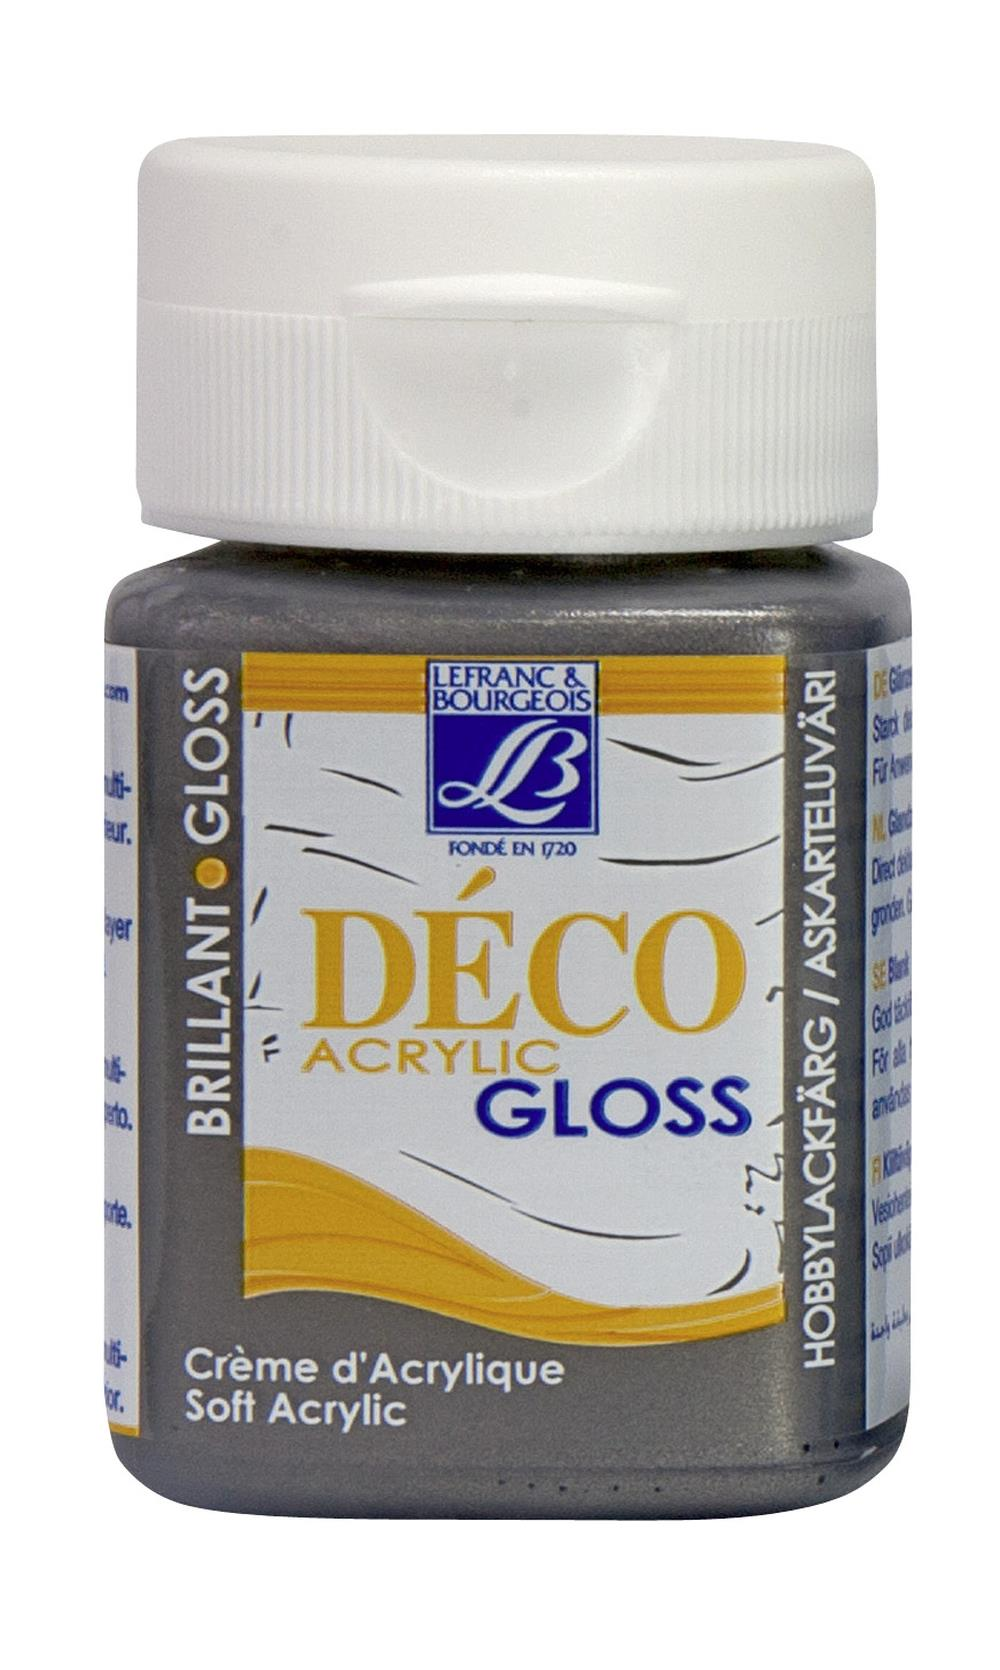 Hobbyfärg L&B Deco Gloss Akryl 50ml Pewter 711 (4F) Utgår